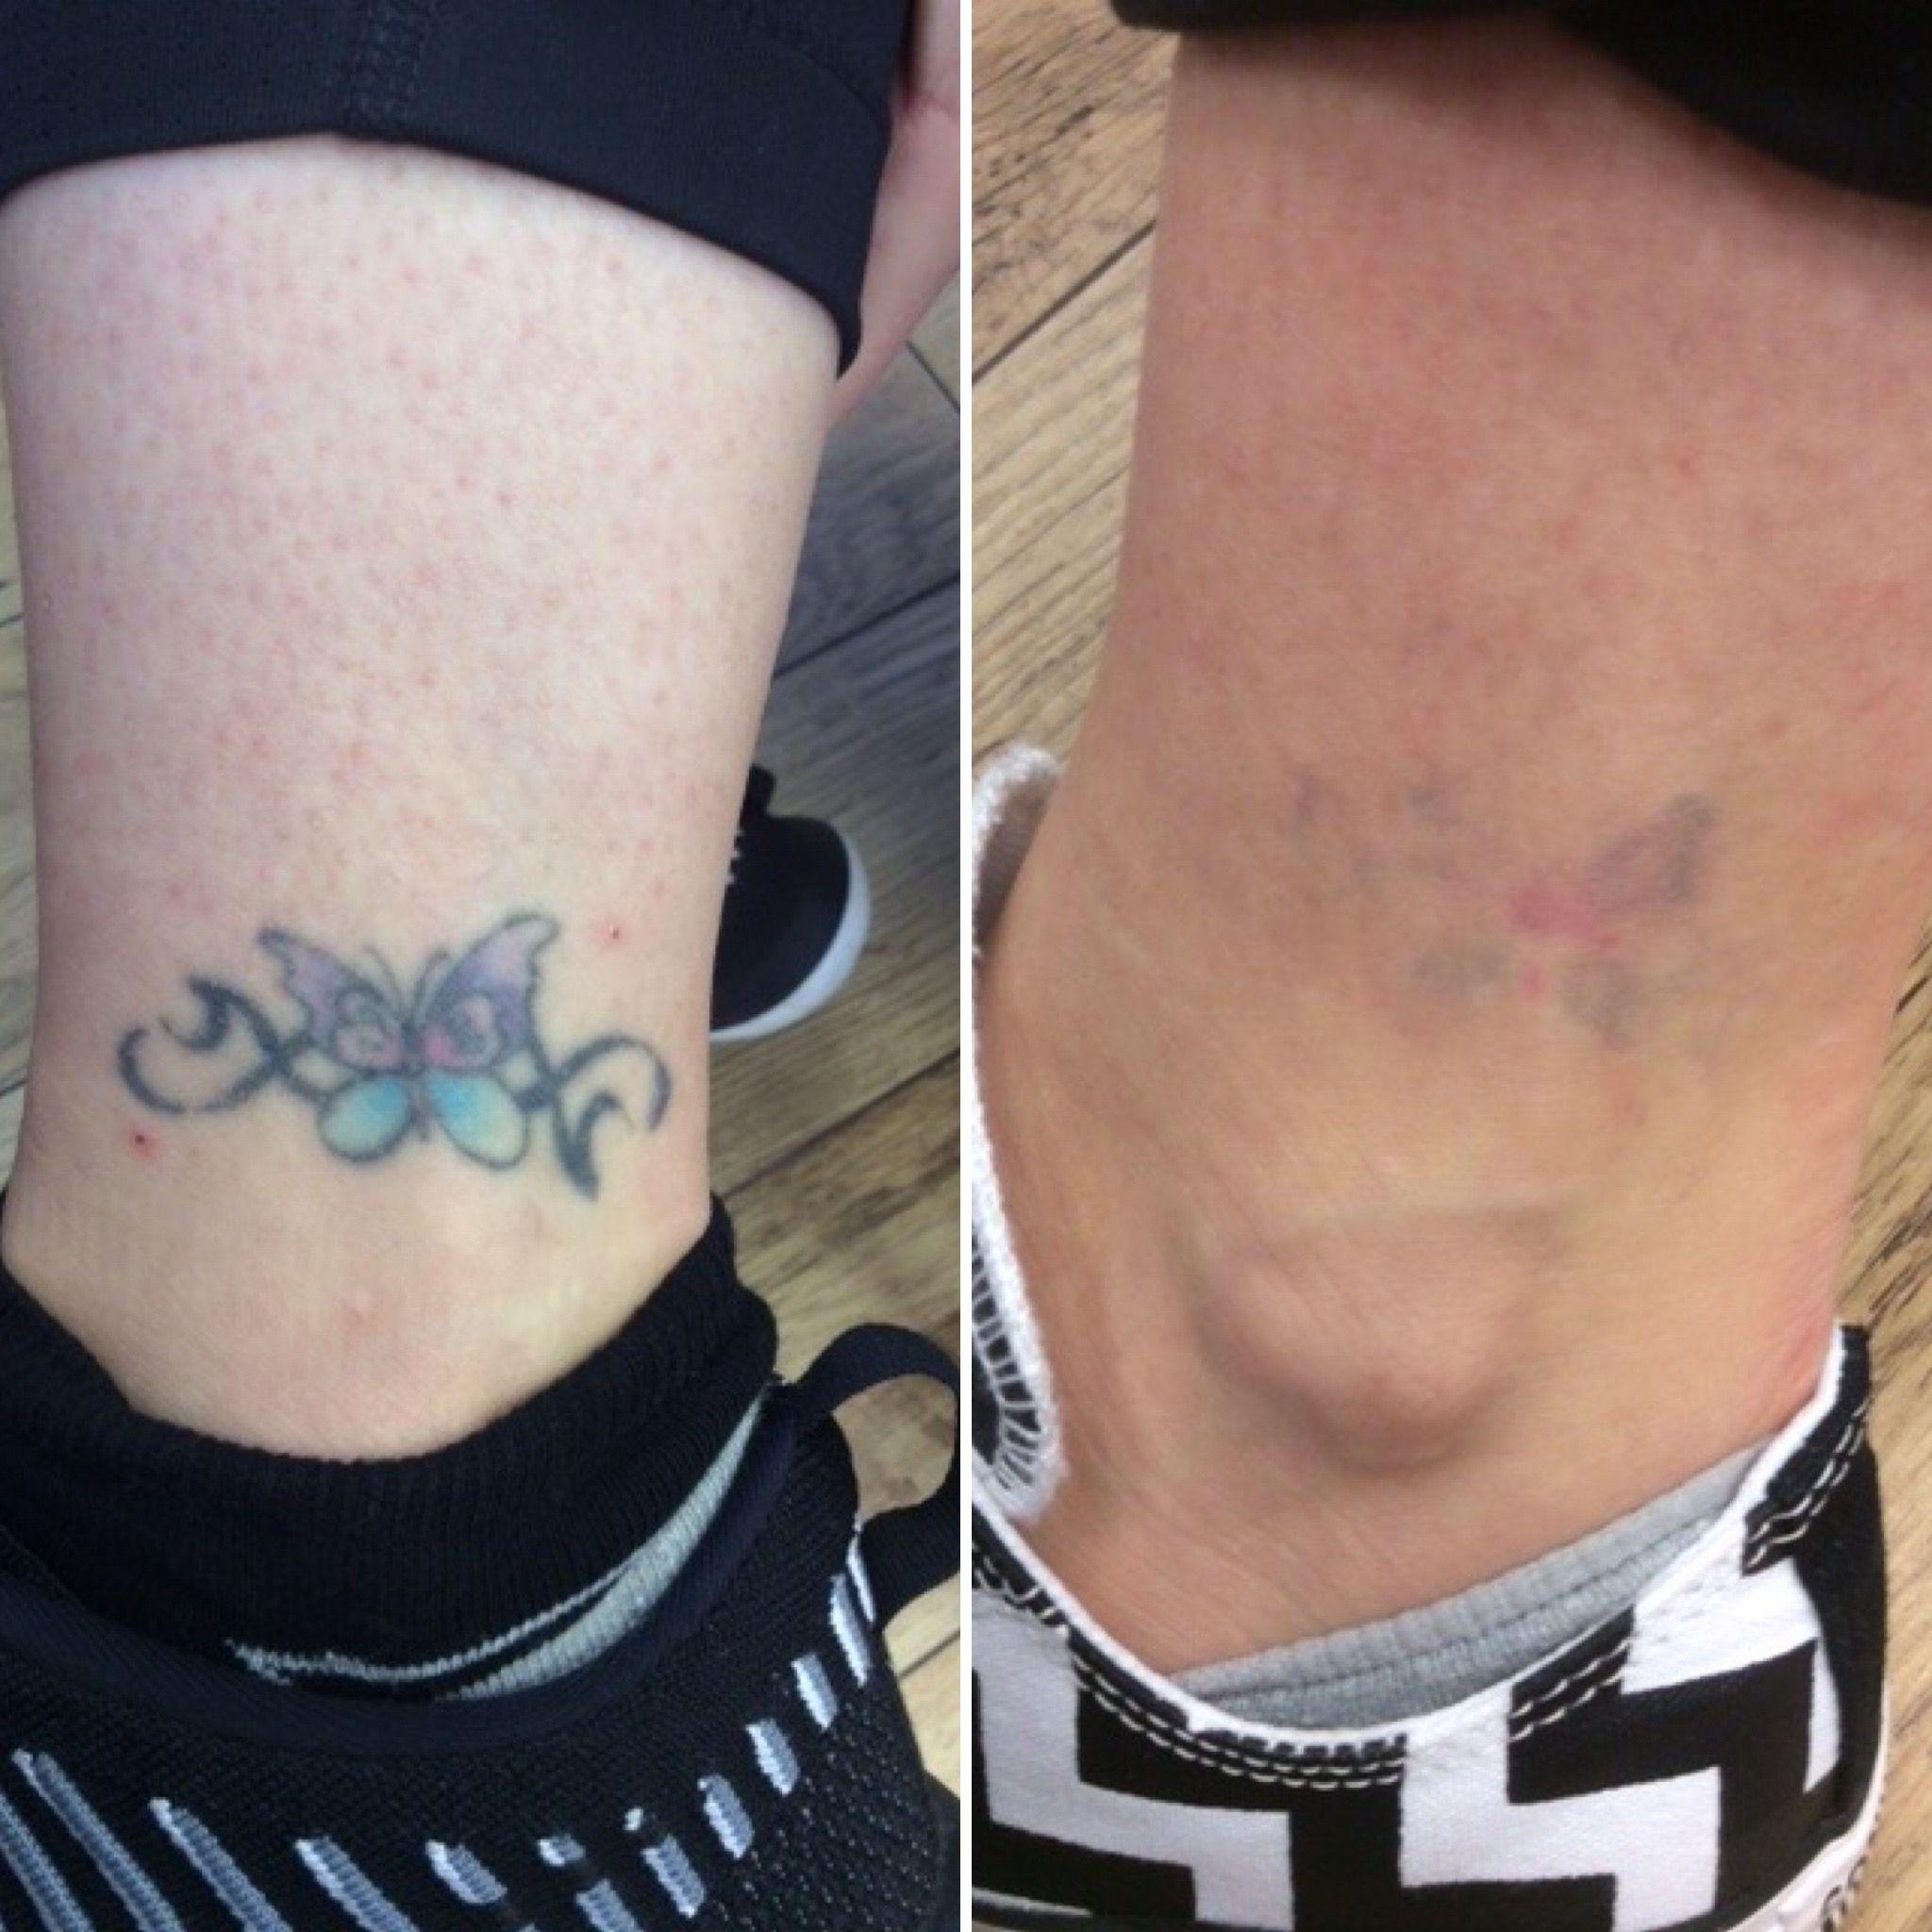 Laser Tattoo Removal Results Laser Tattoo Tattoo Removal Results Laser Tattoo Removal